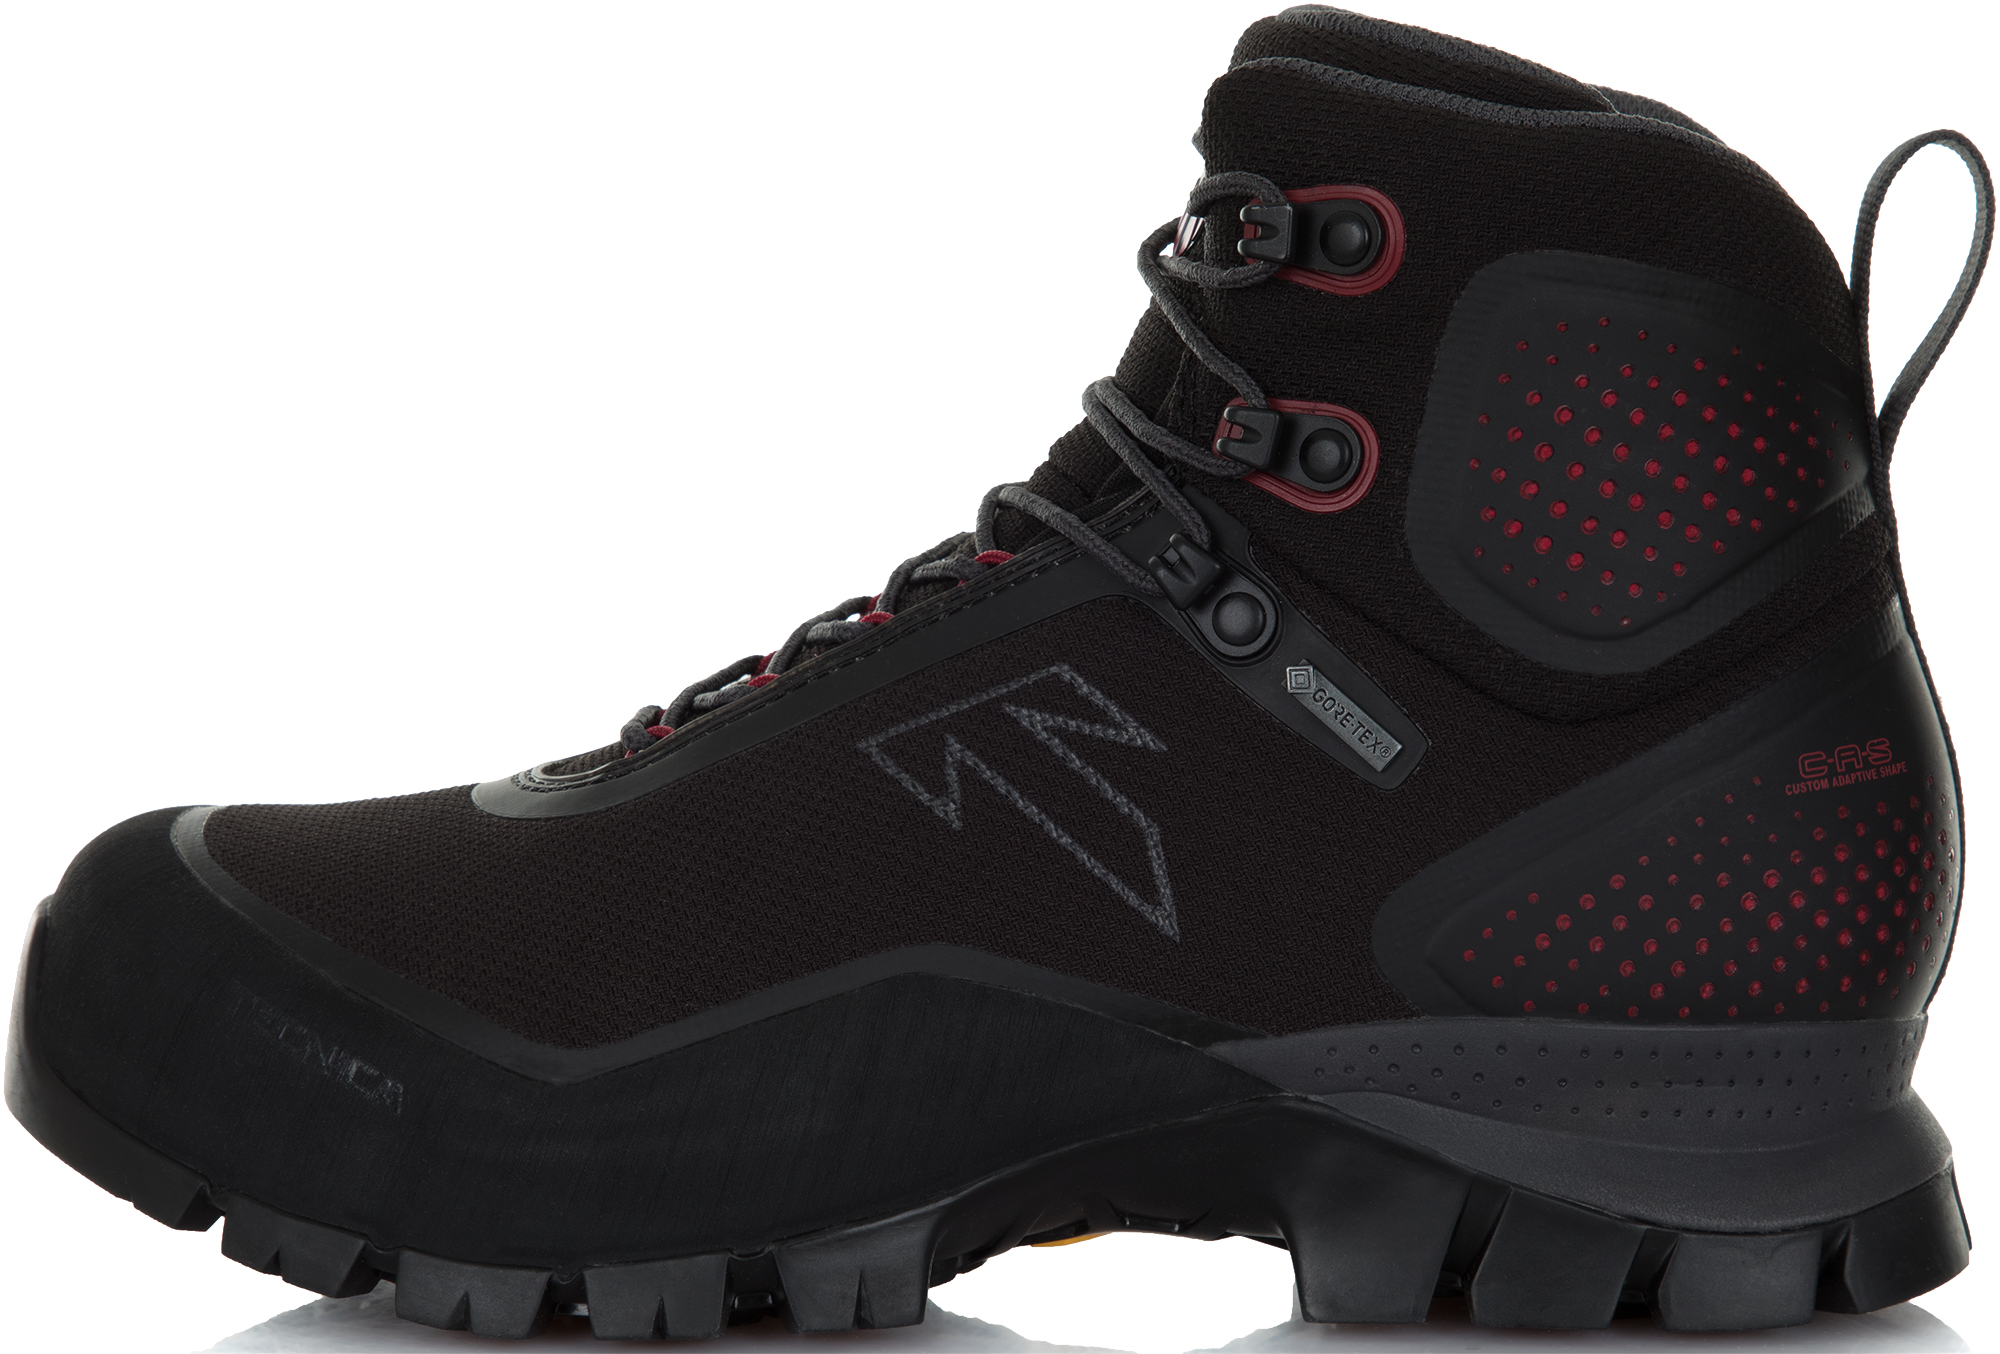 Tecnica Ботинки женские Tecnica Forge, размер 39